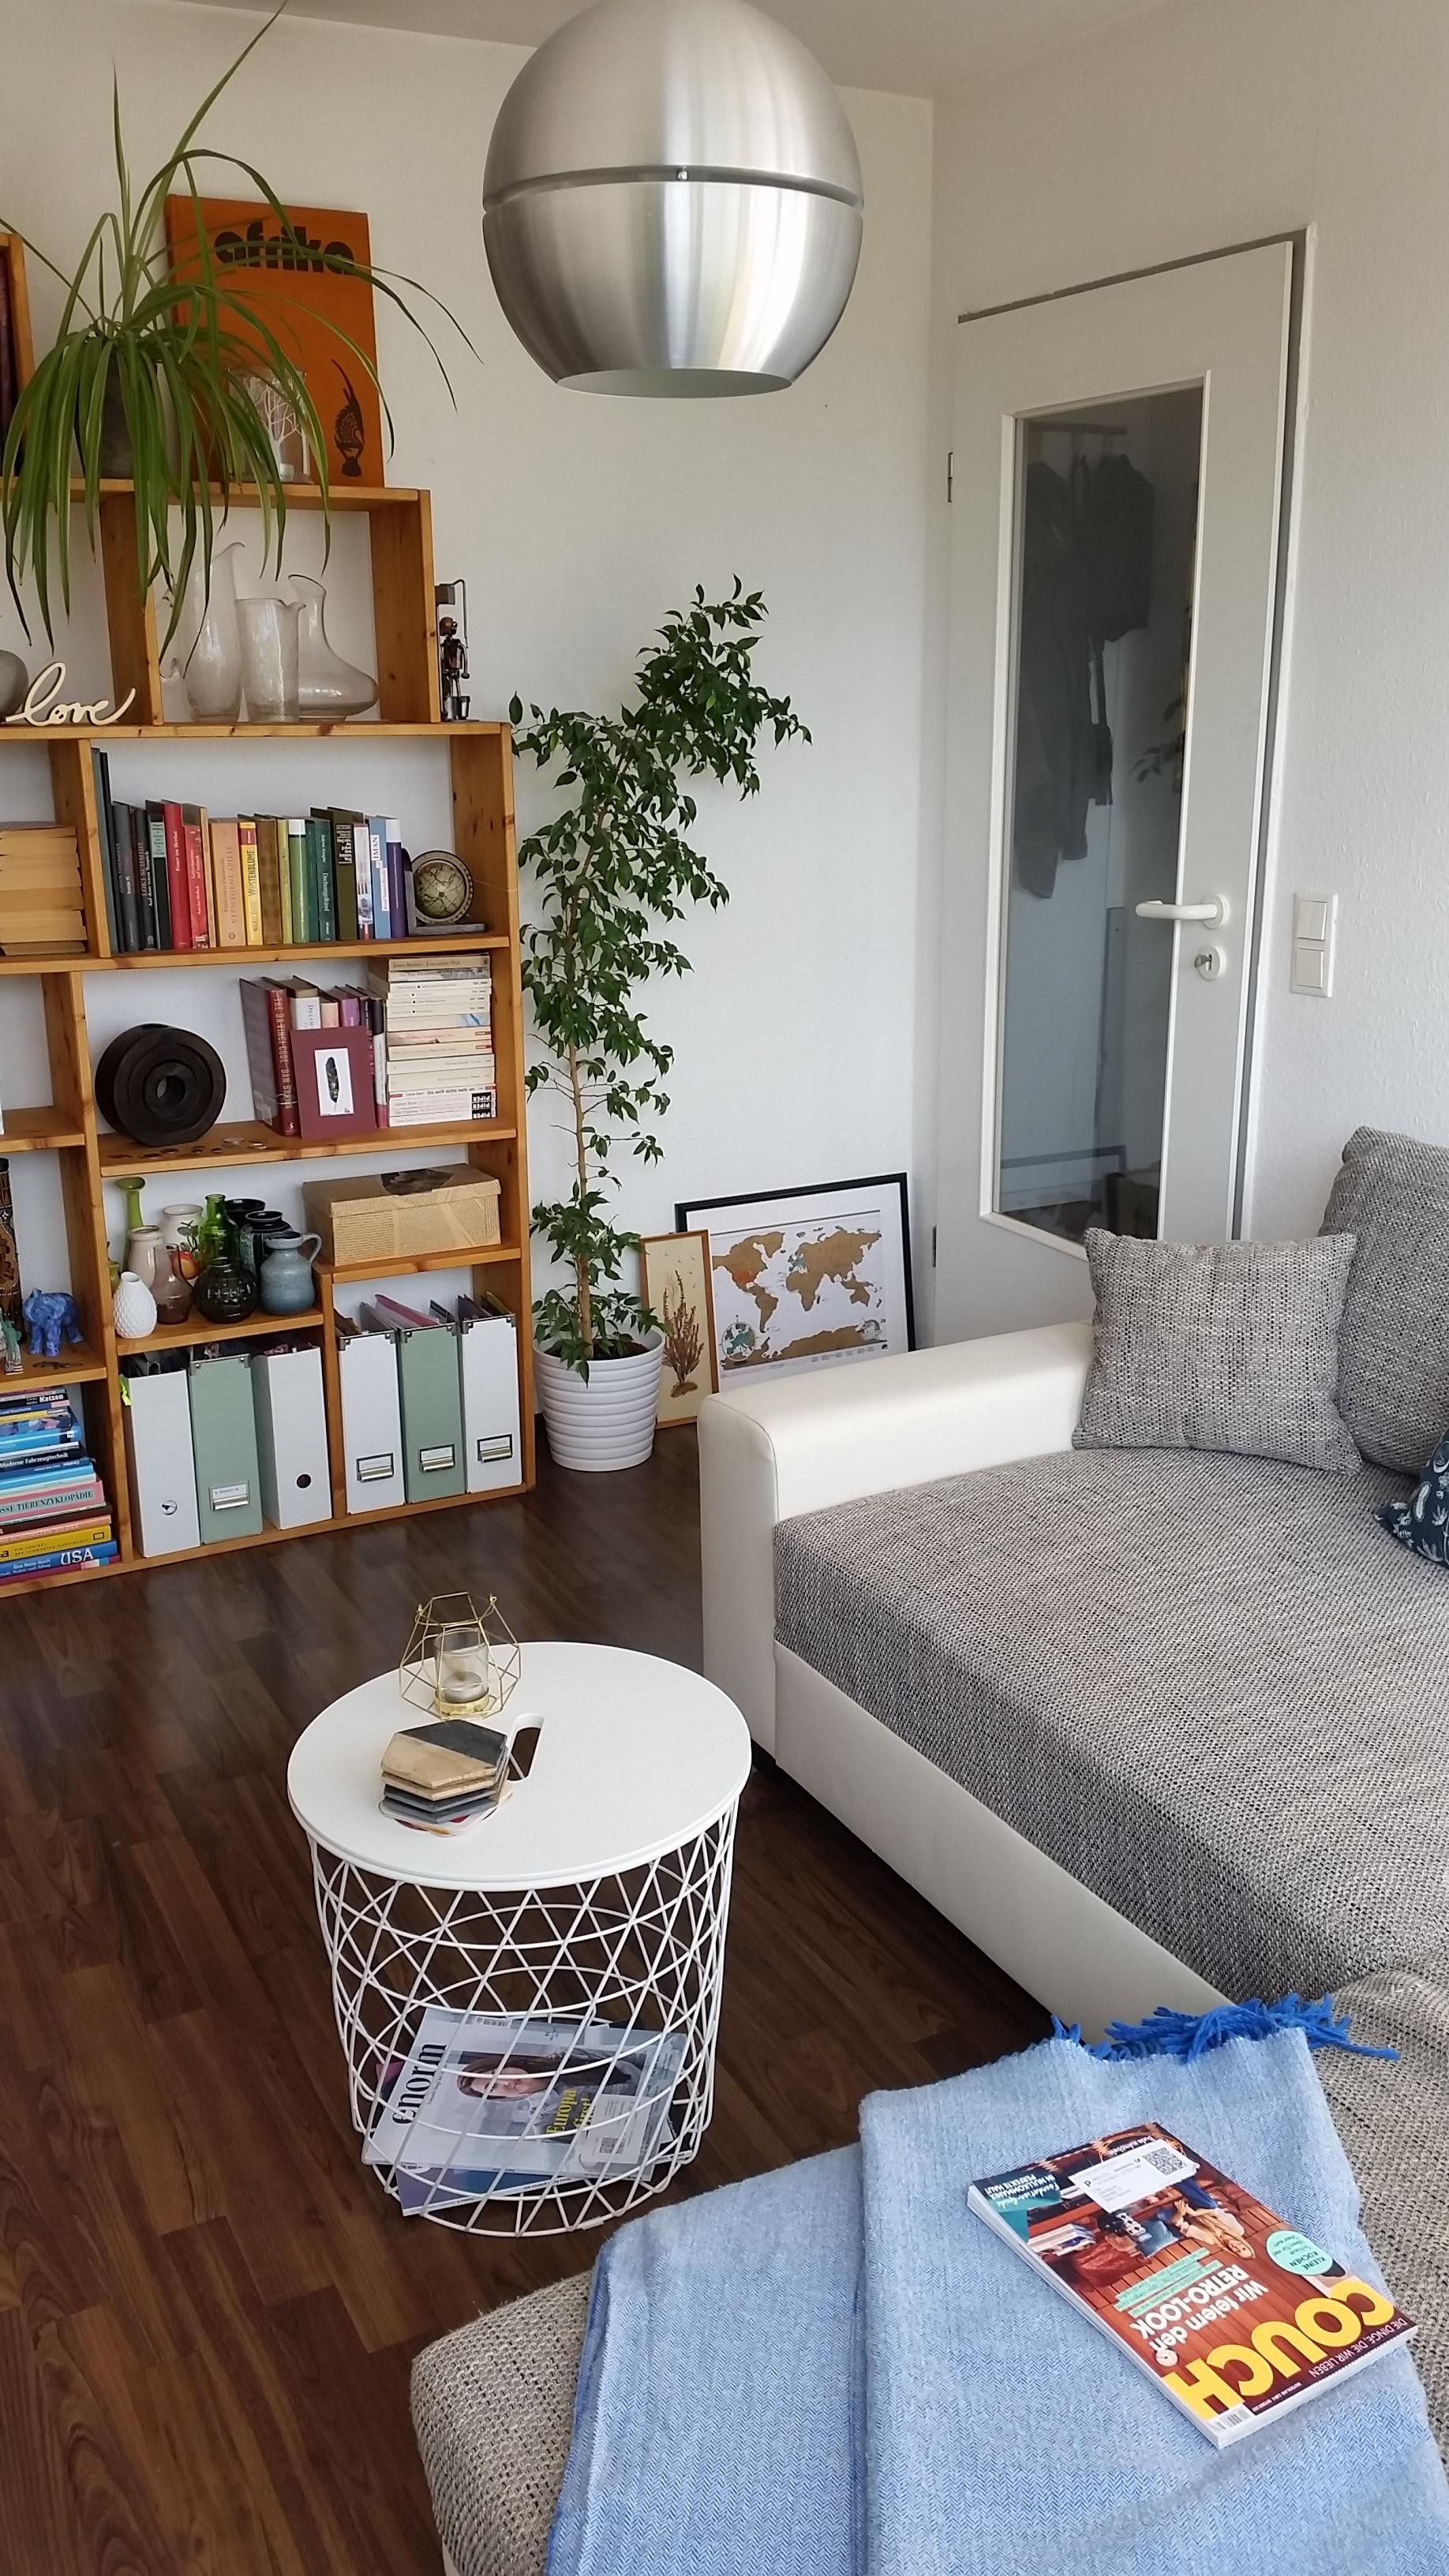 ikea bilder ideen couchstyle. Black Bedroom Furniture Sets. Home Design Ideas